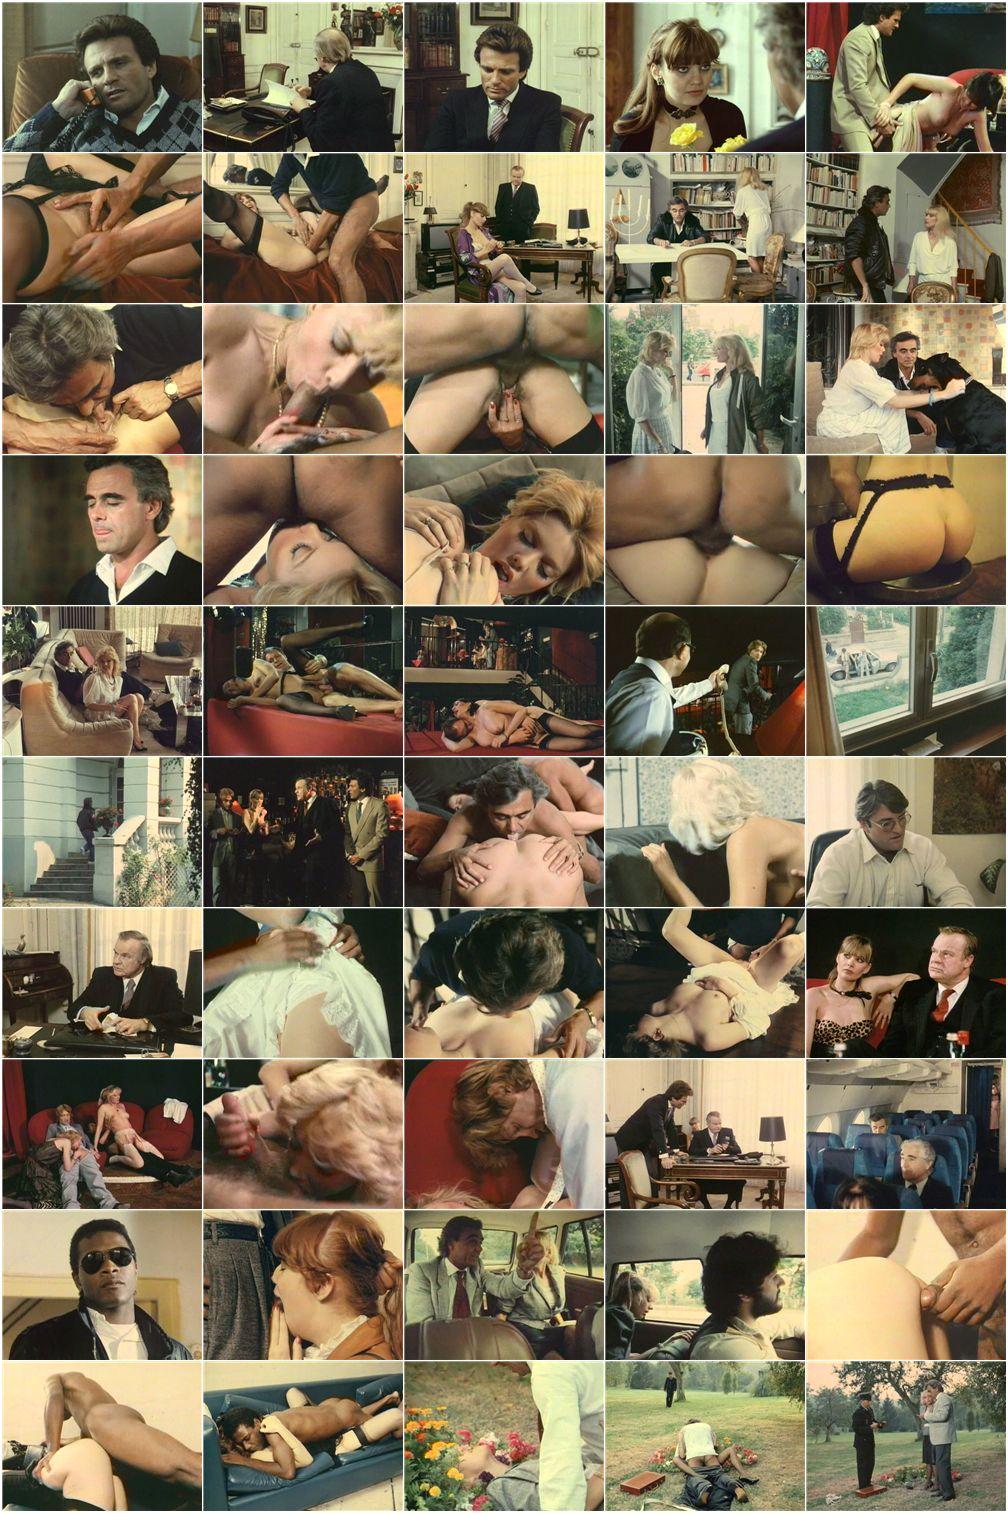 novi-ruski-porno-filmi